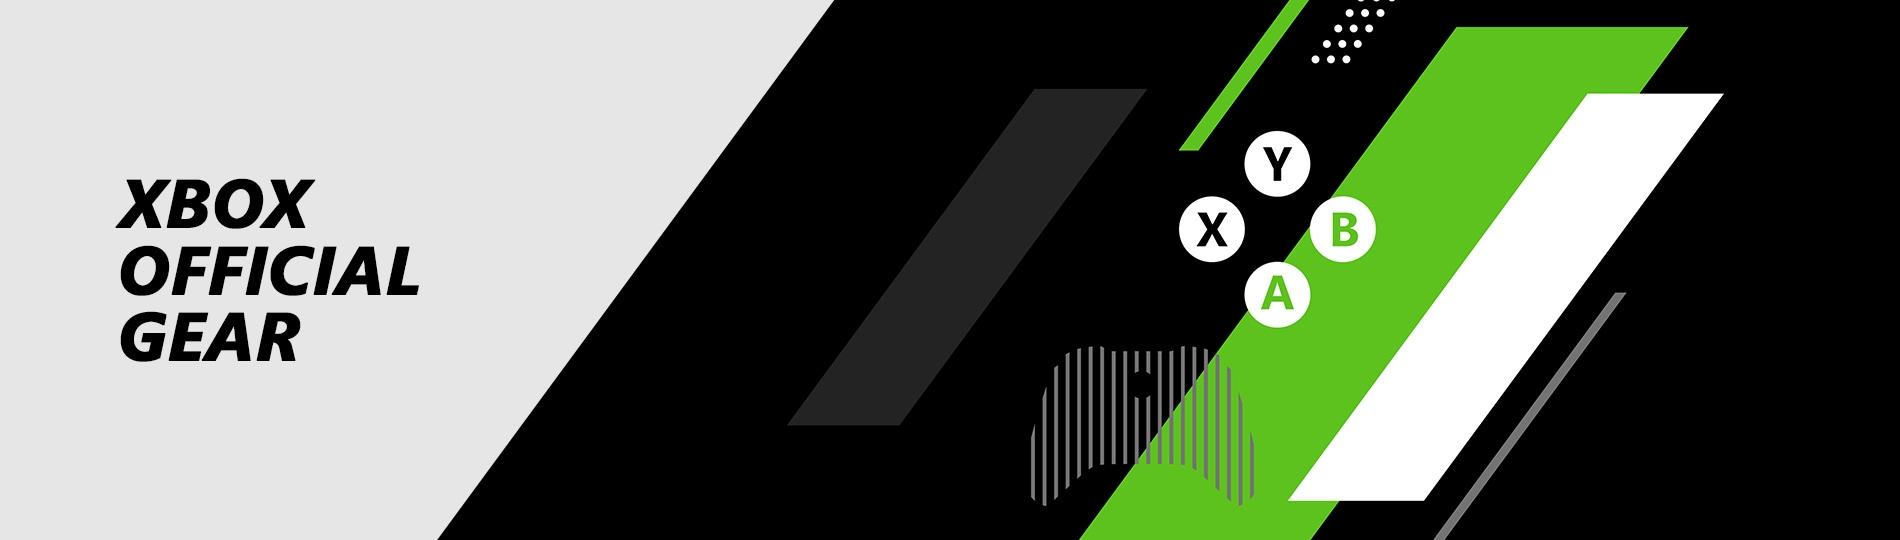 22553f69262 Shop More Gear - Xbox Official Gear - Microsoft